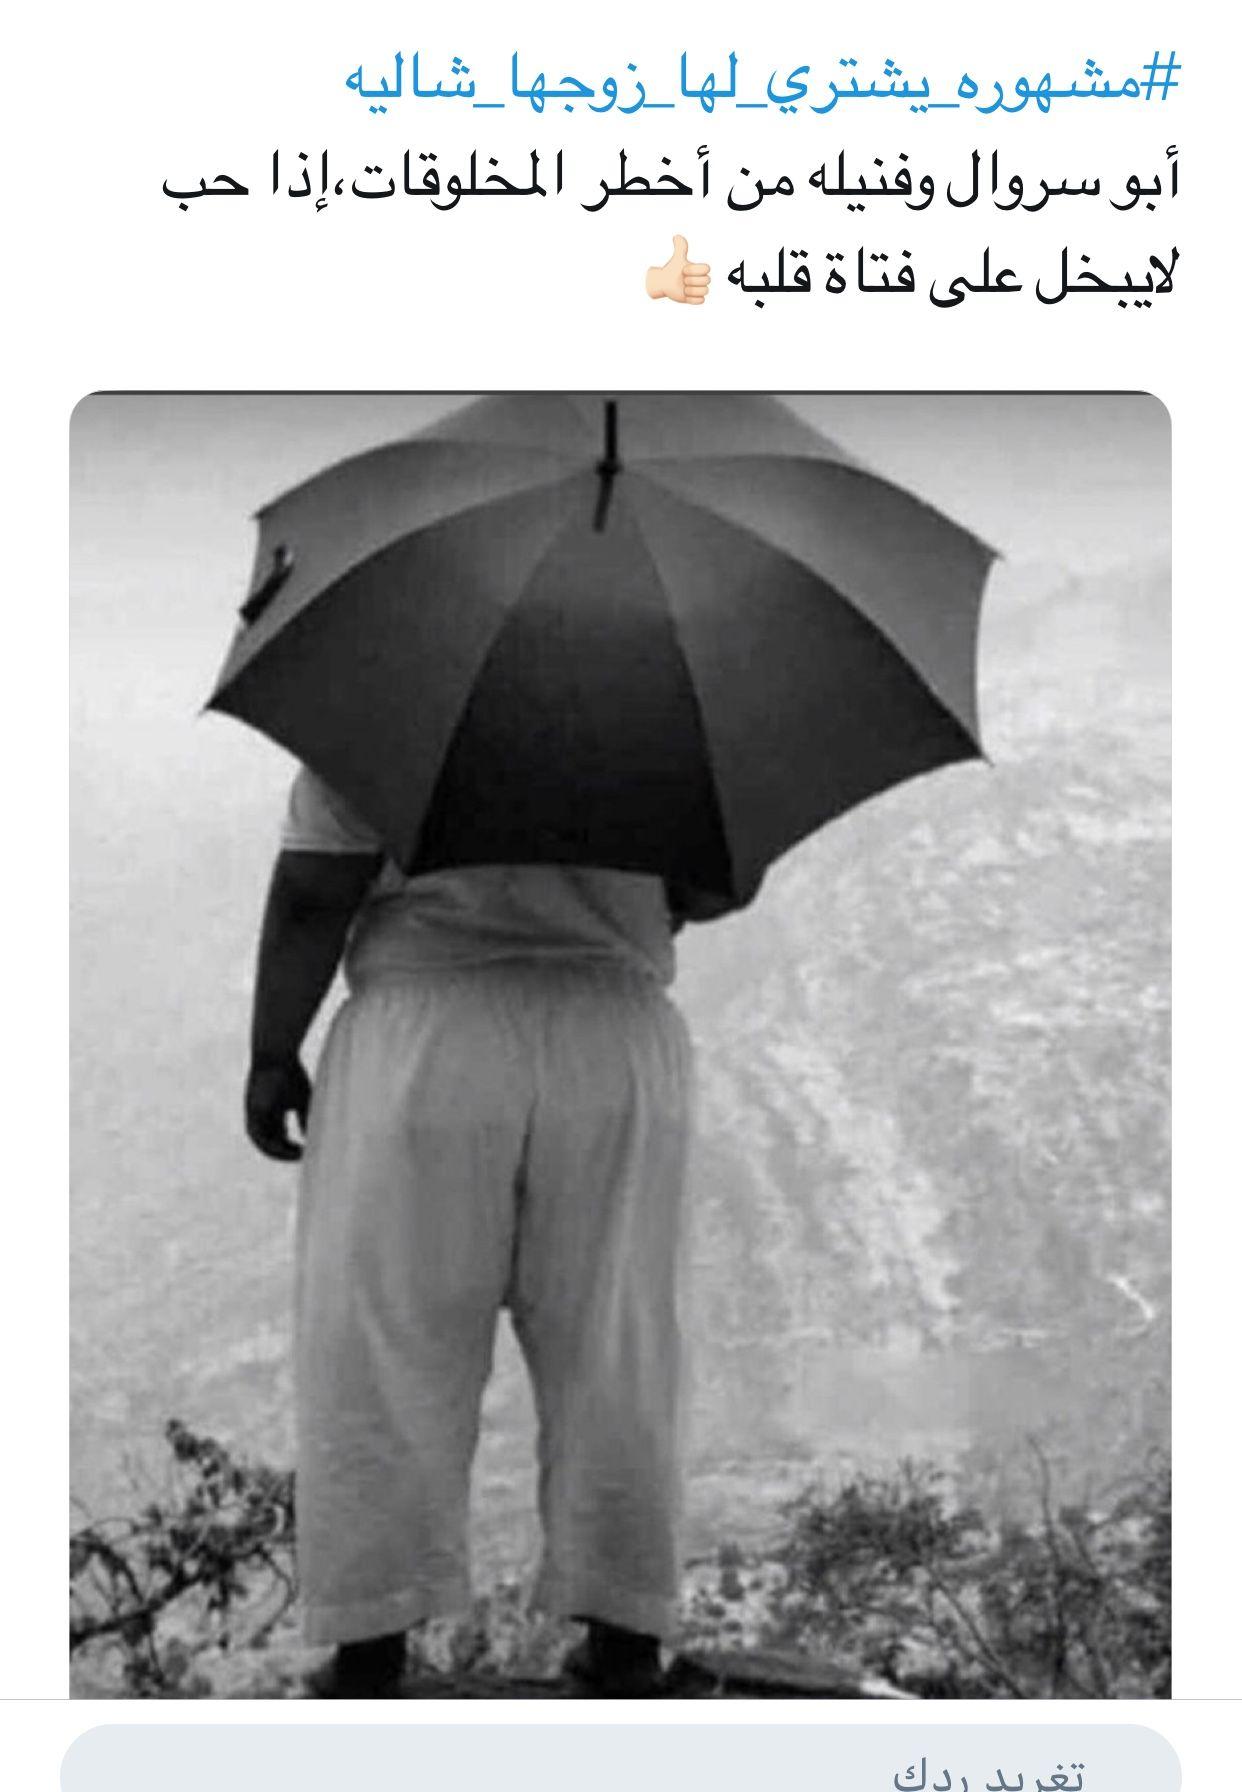 بروفه الأوركسترا السعودية ابو سروال وفنيلة Saudi Orchestra Places To Visit Movie Posters Poster